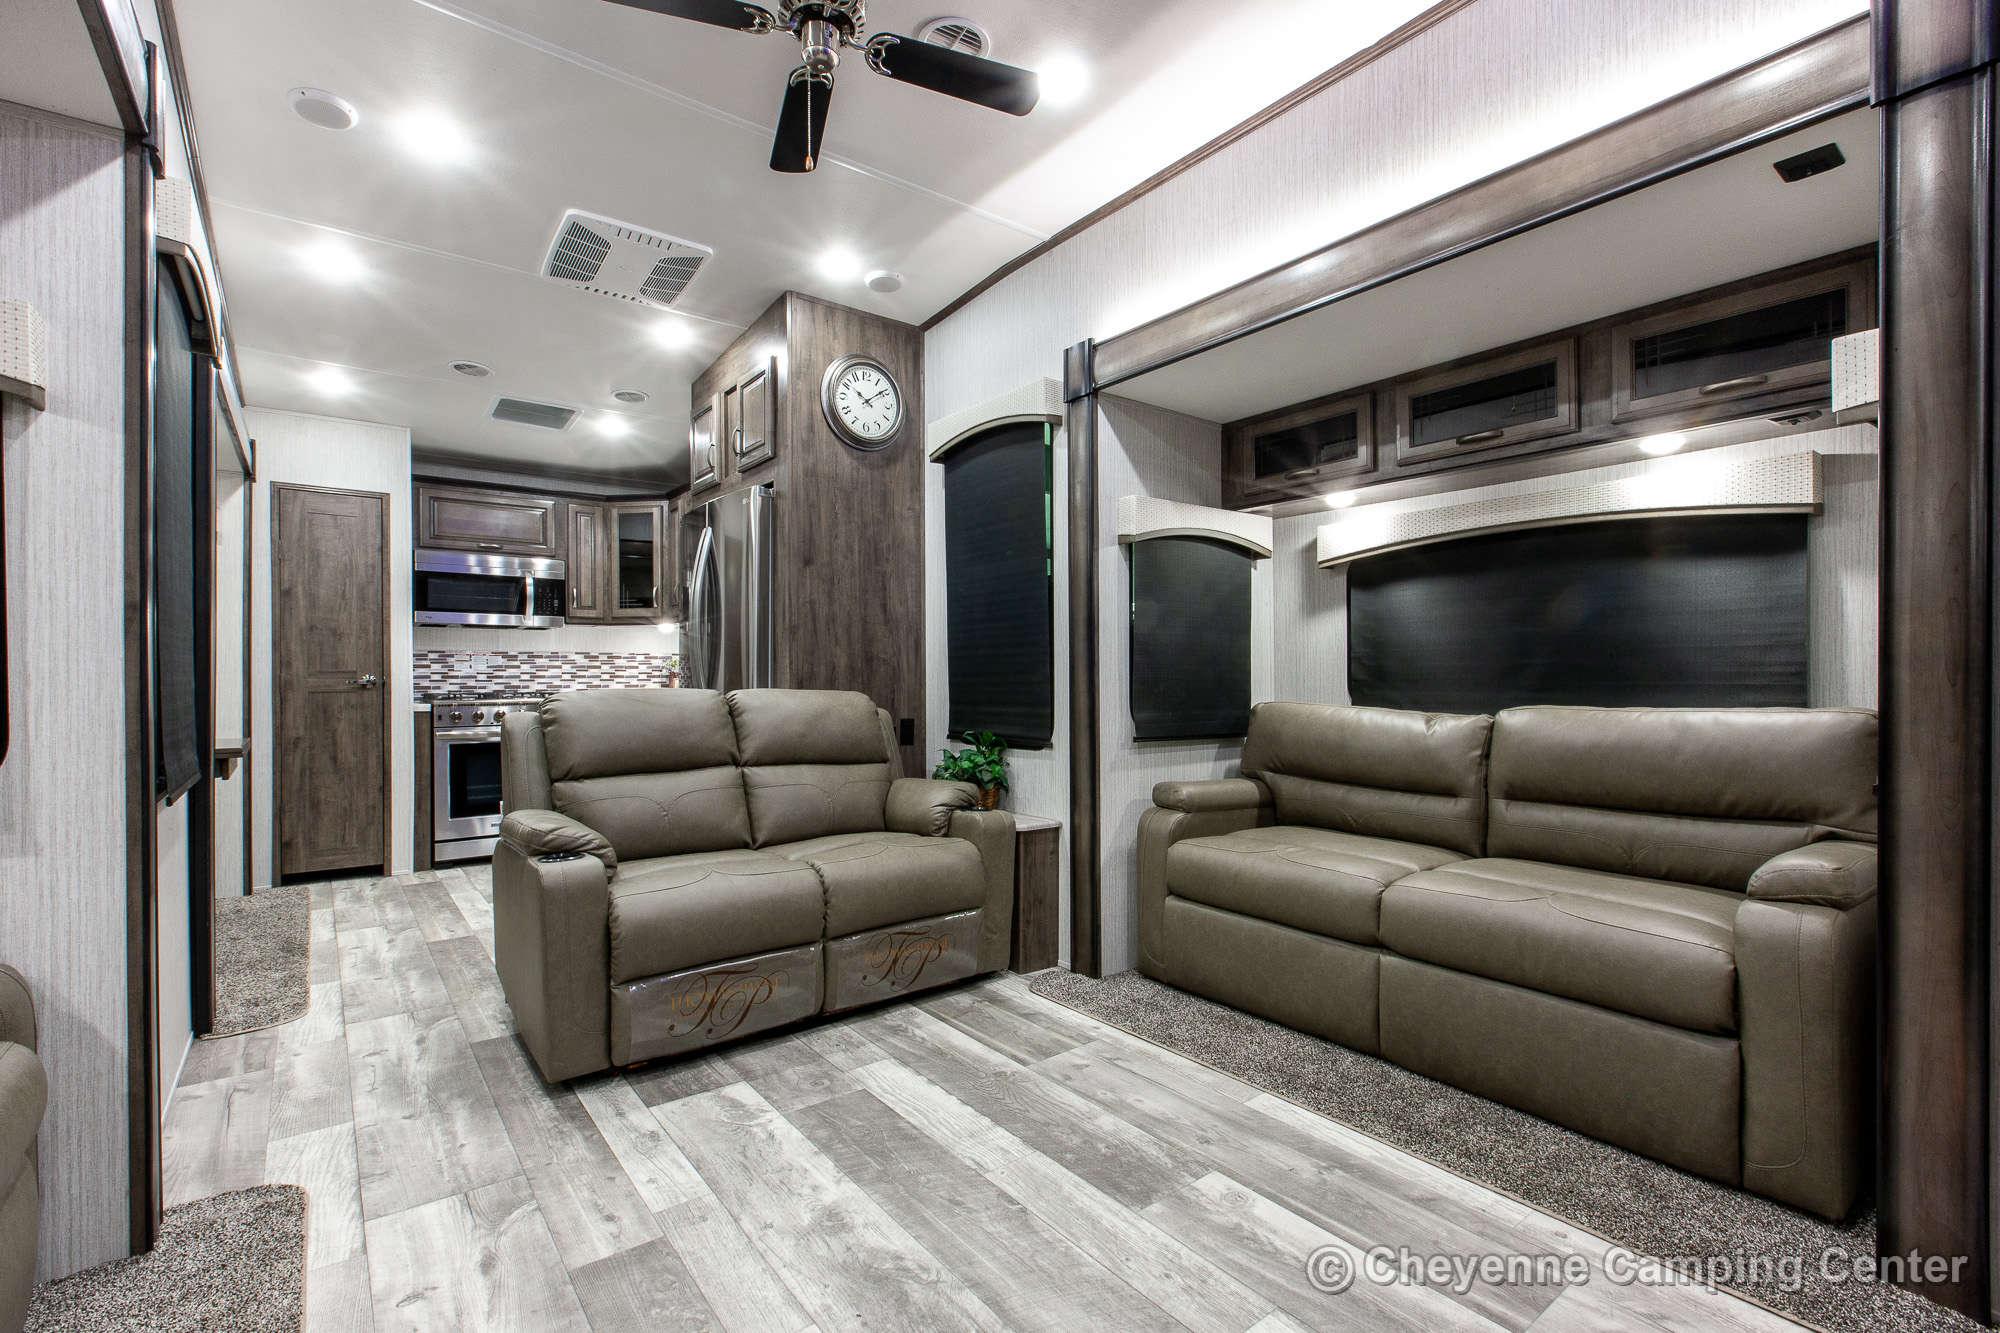 2021 Forest River Sierra 39BARK Fifth Wheel Interior Image